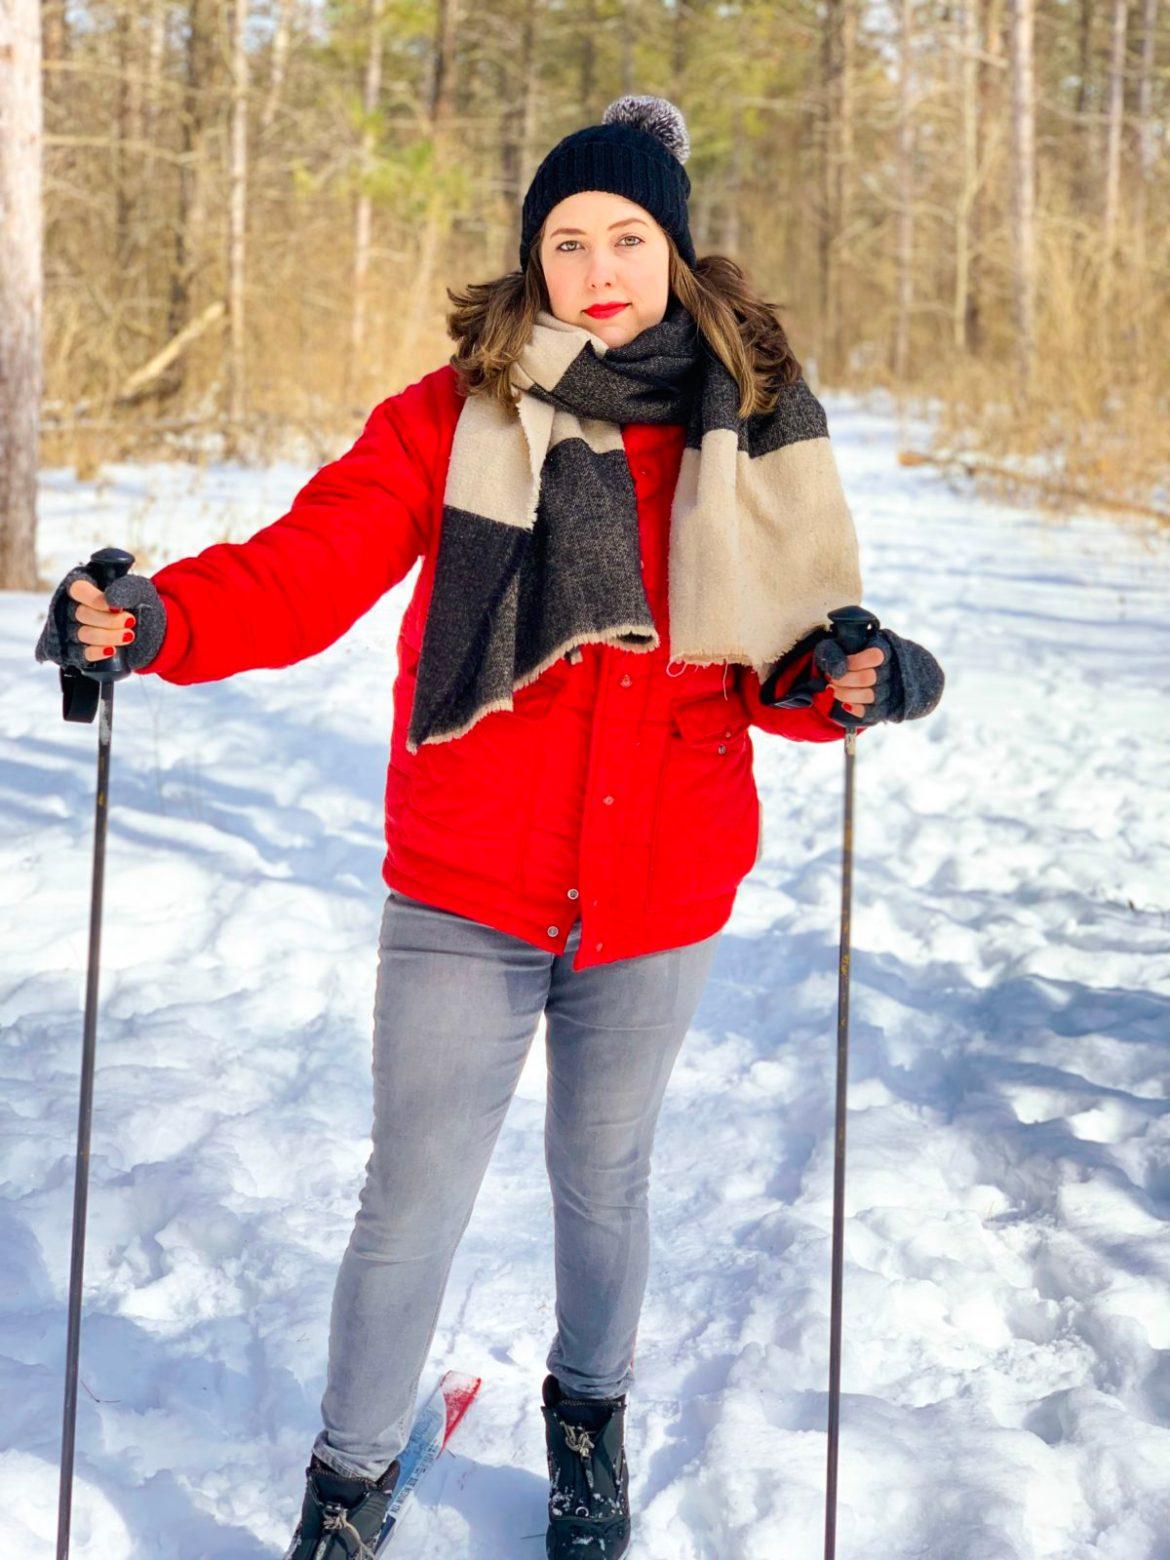 Skiing Adventure